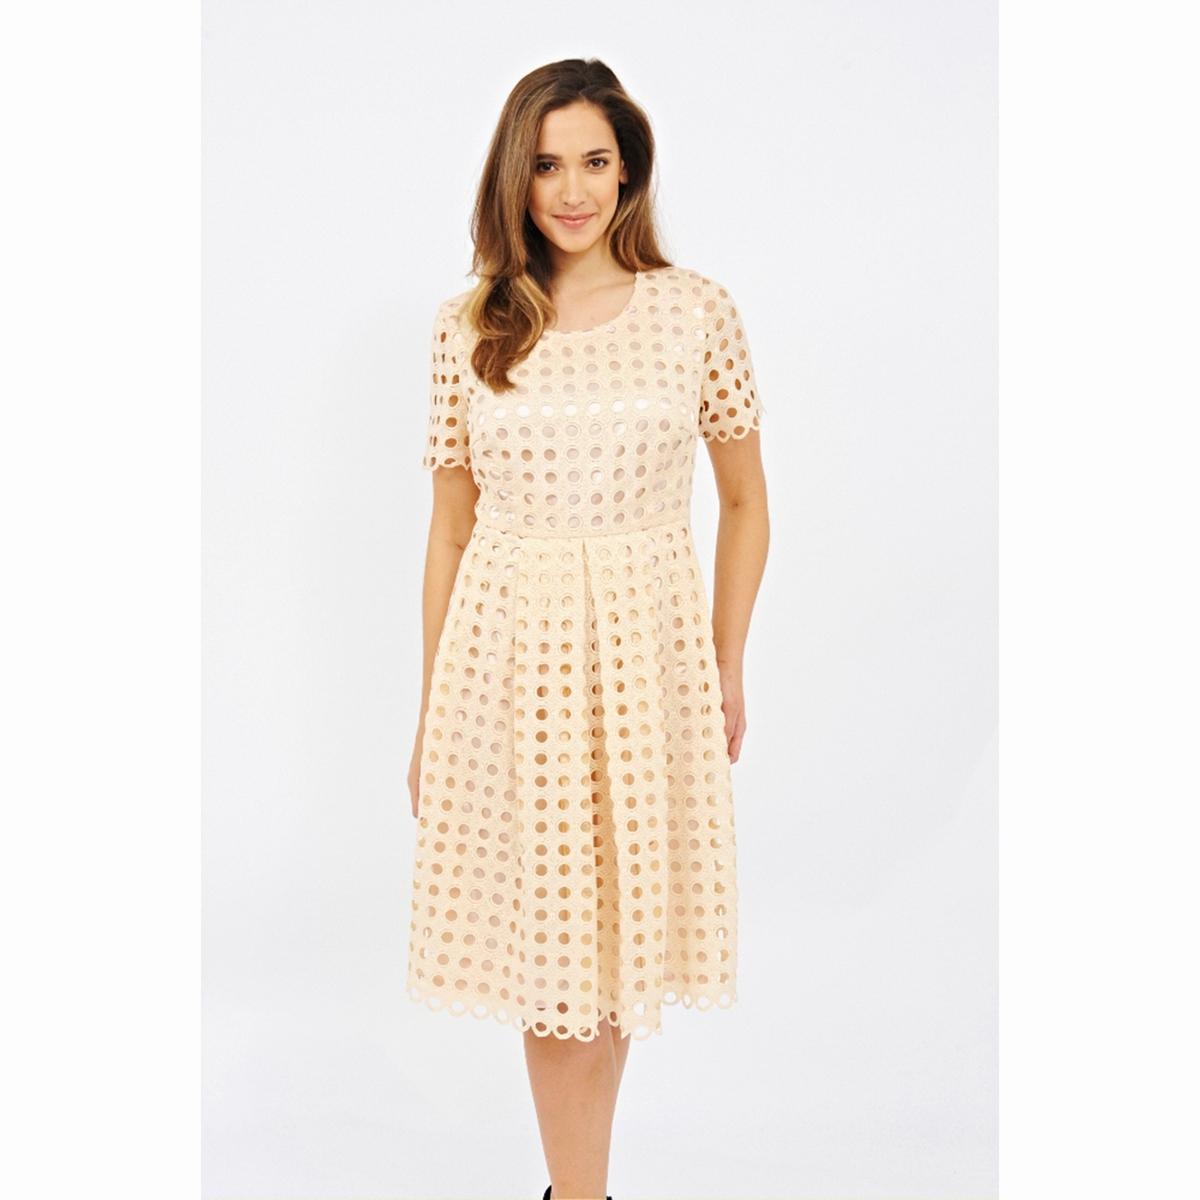 Платье с короткими рукавамиПлатье с короткими рукавами LOVEDROBE. Длина ок. 104 см . 100% полиэстер<br><br>Цвет: бежевый<br>Размер: 58/60 (FR) - 64/66 (RUS)